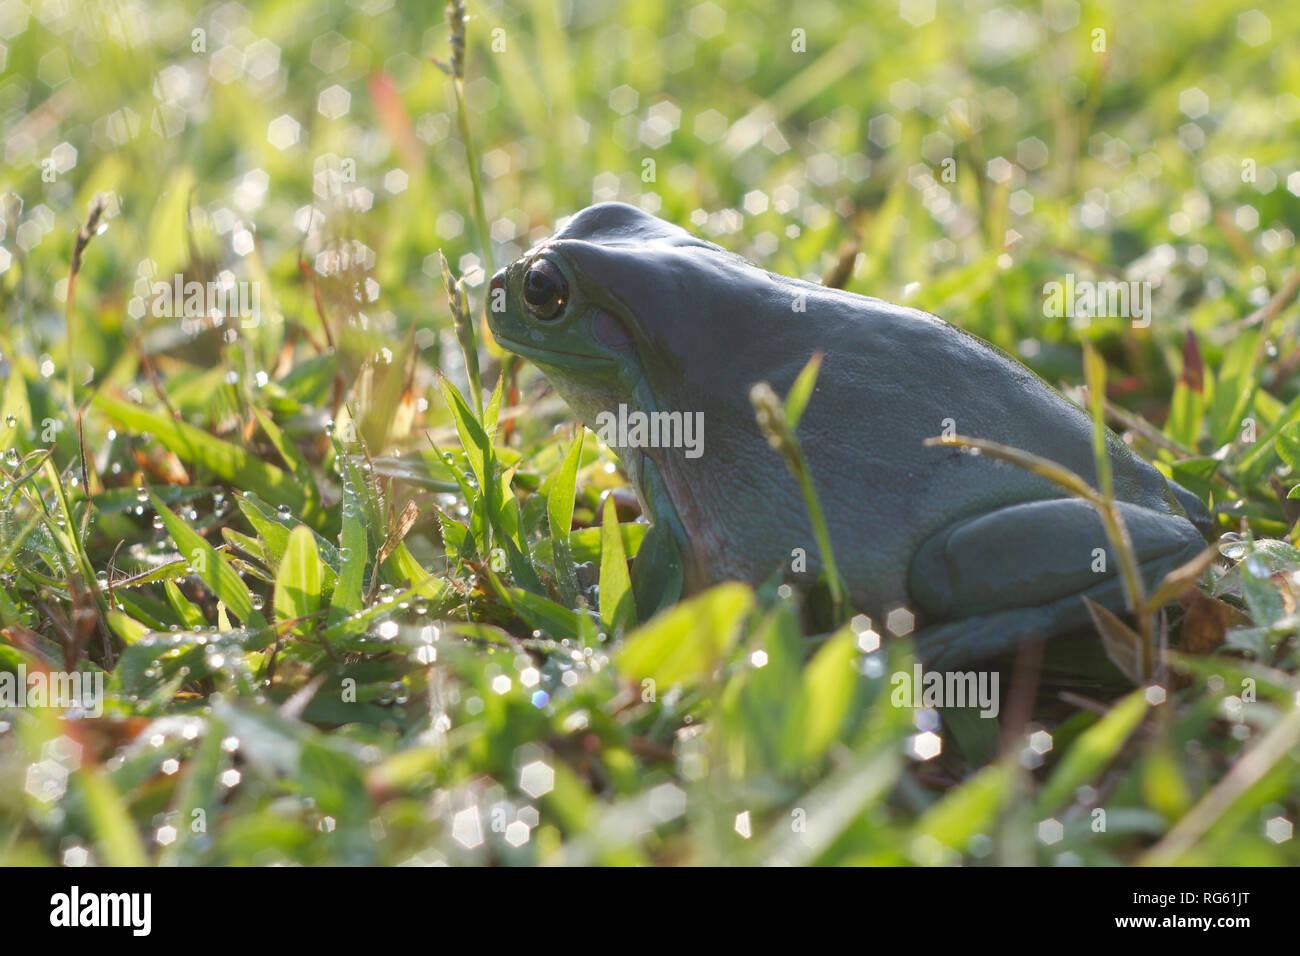 Australian Green Tree Frog sitting on wet grass, Indonesia Stock Photo